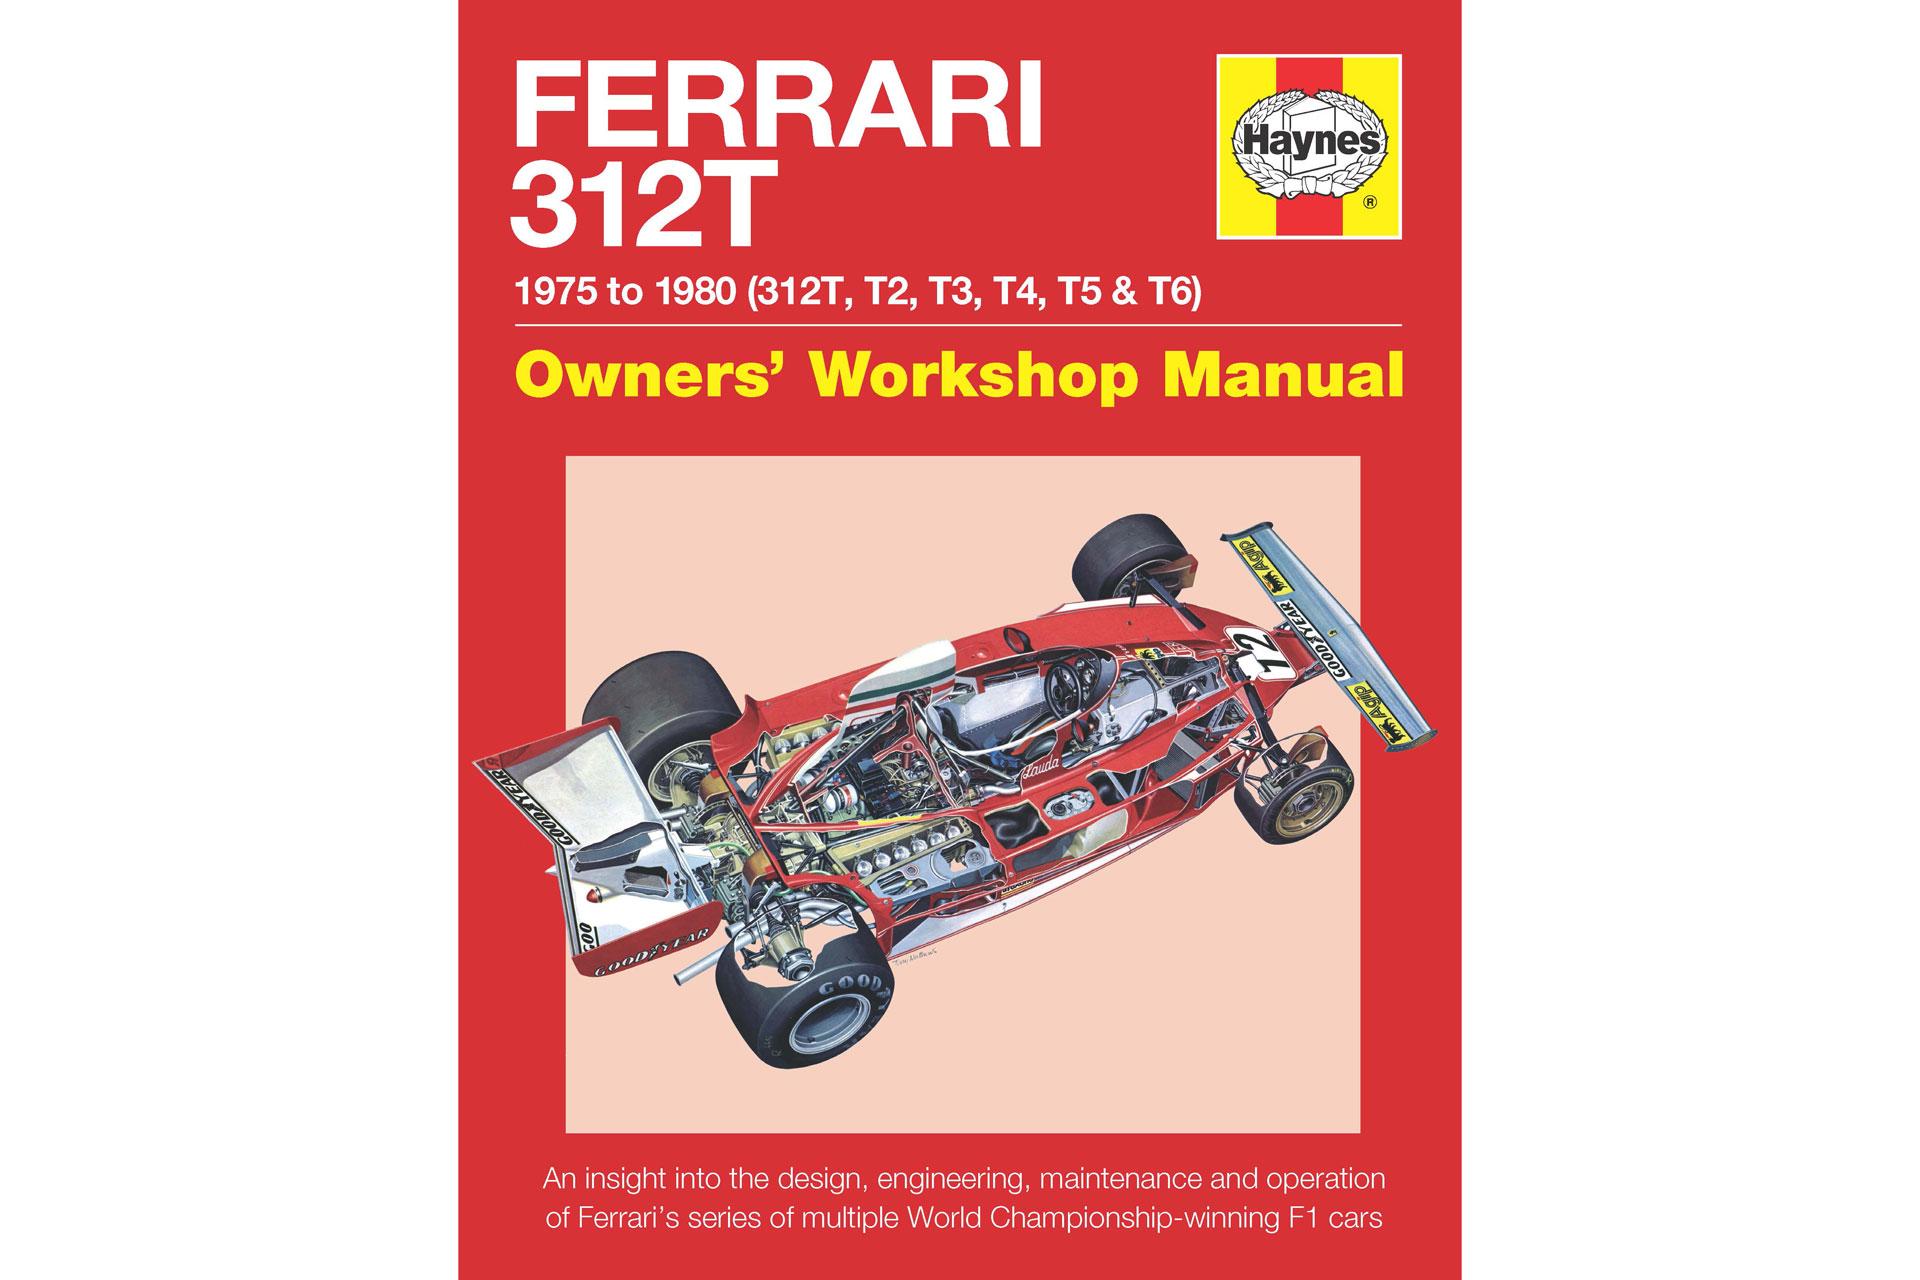 Haynes Ferrari 312T Front Cover